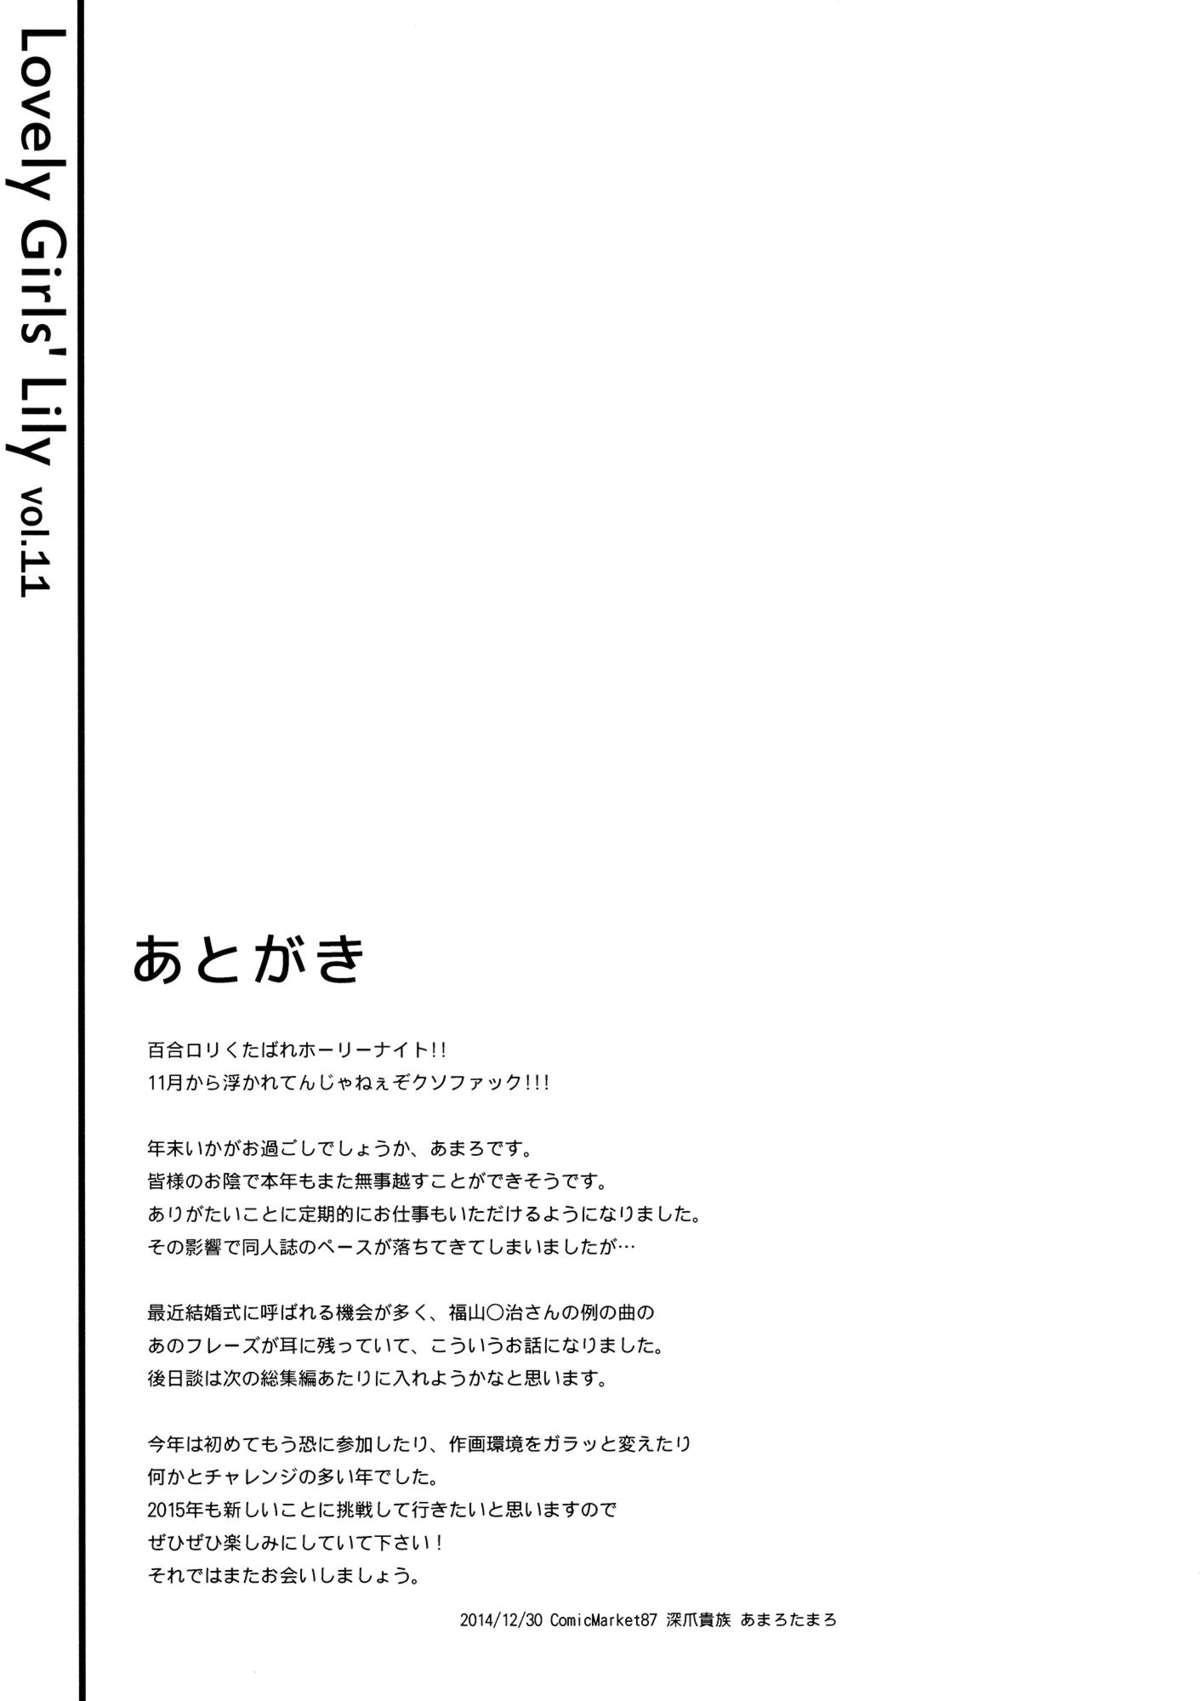 Lovely Girls' Lily Vol. 11 20